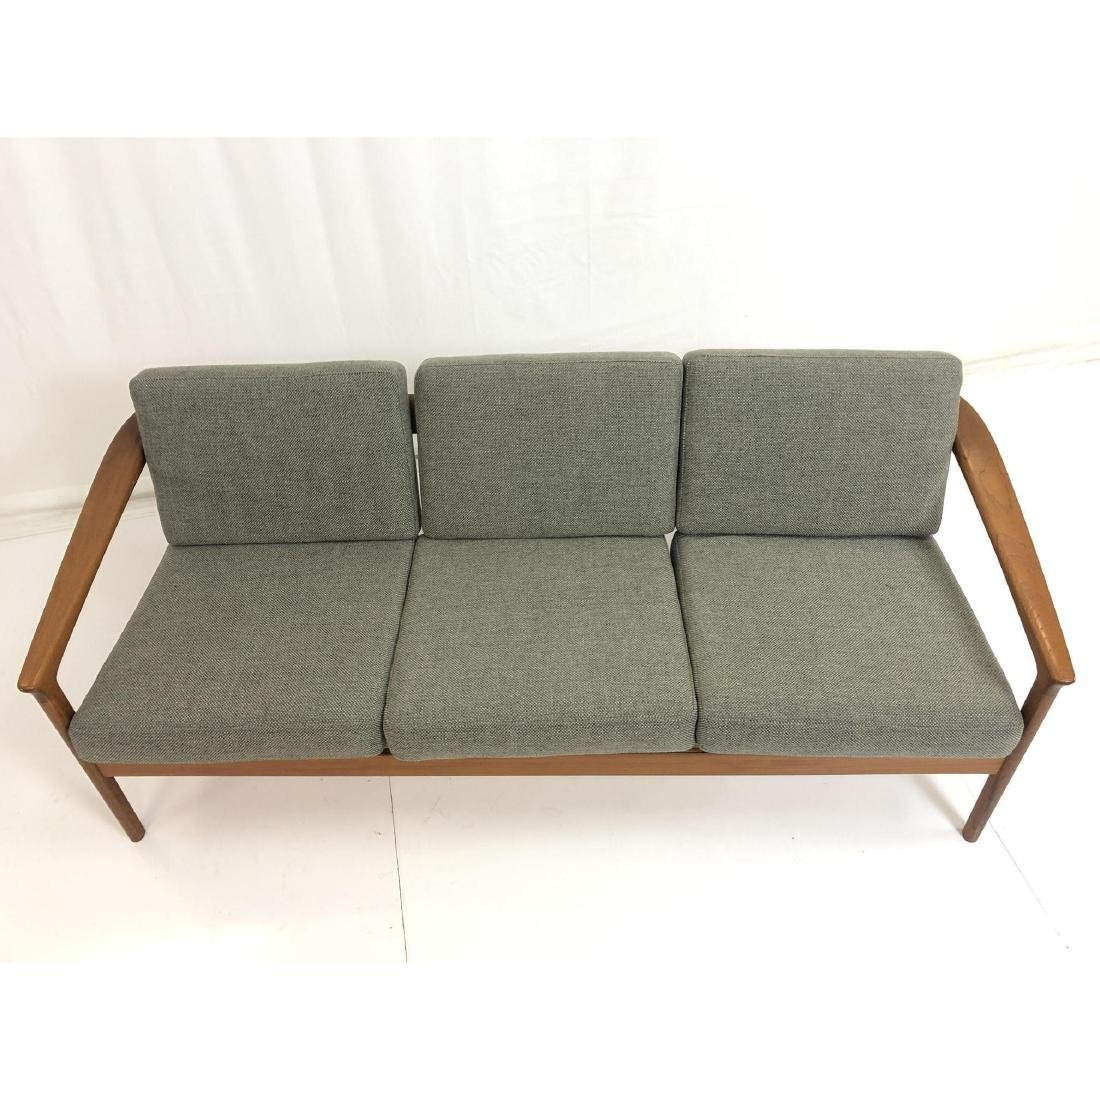 FOLKE OHLSSON Danish Modern Teak Sofa Couch . Ele - 4